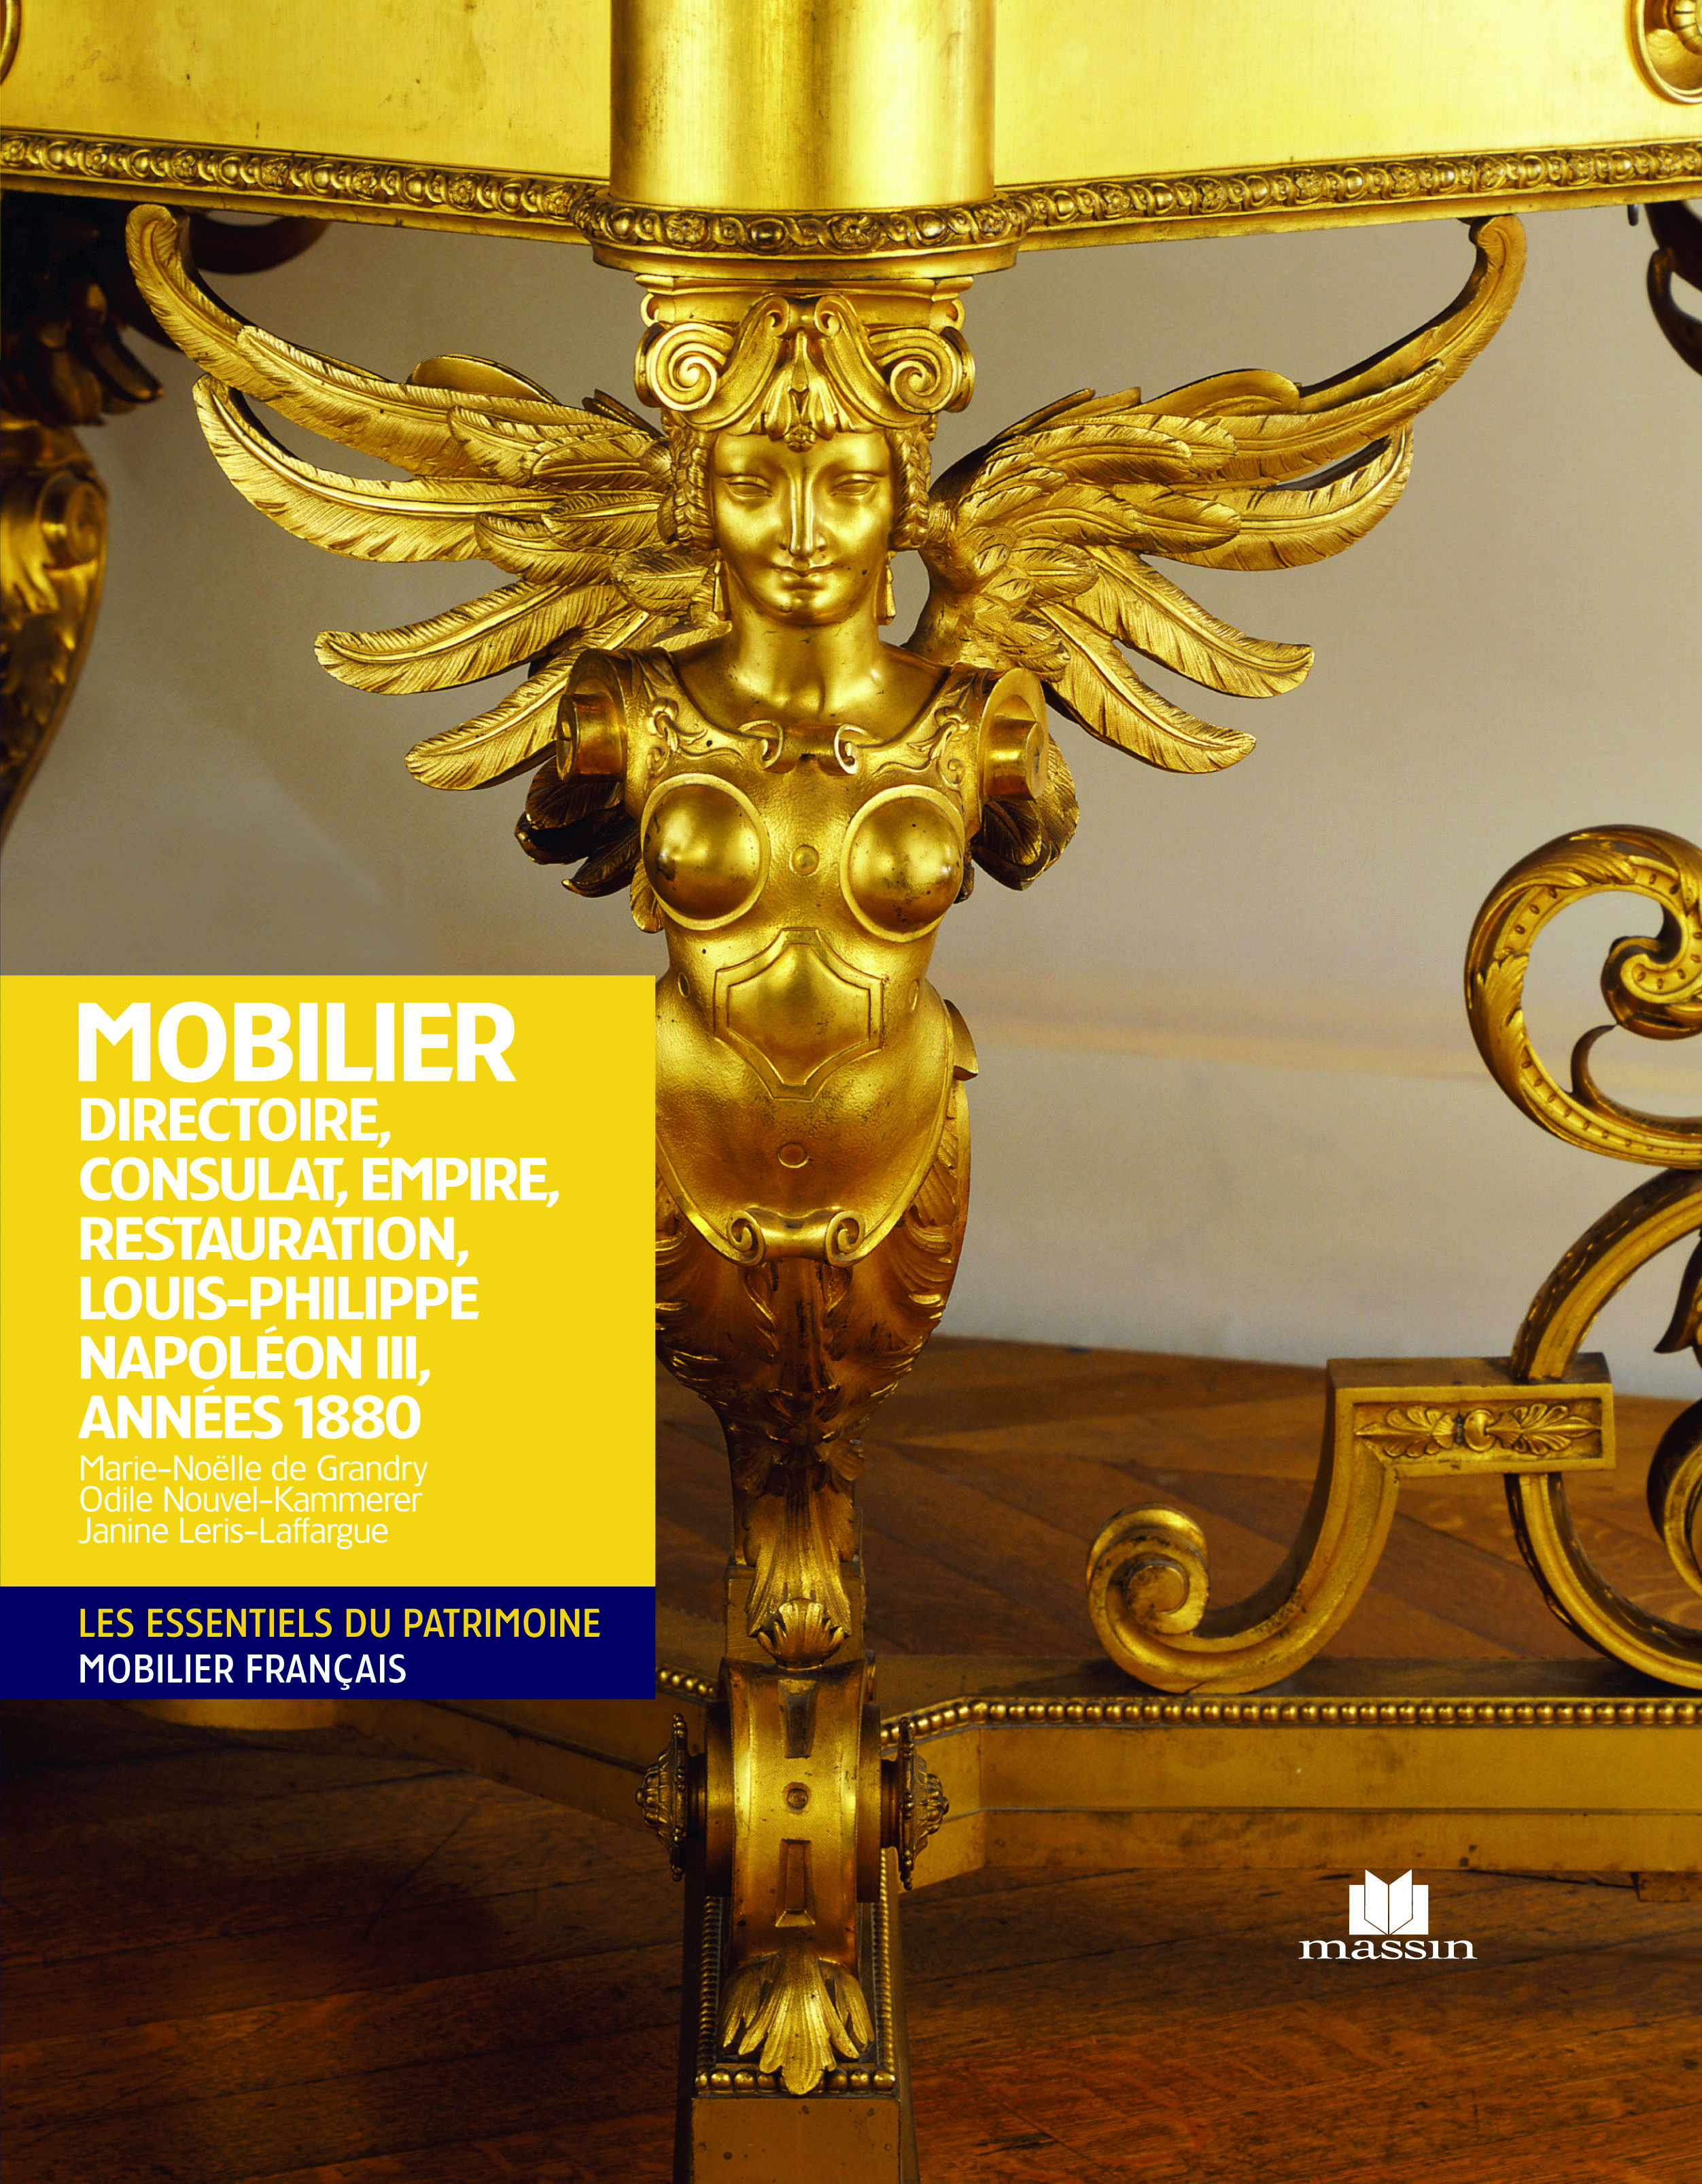 MOBILIER DIRECTOIRE CONSULAT EMPIRE RESTAURATION LOUIS-PHILIPPE NAPOLEON III